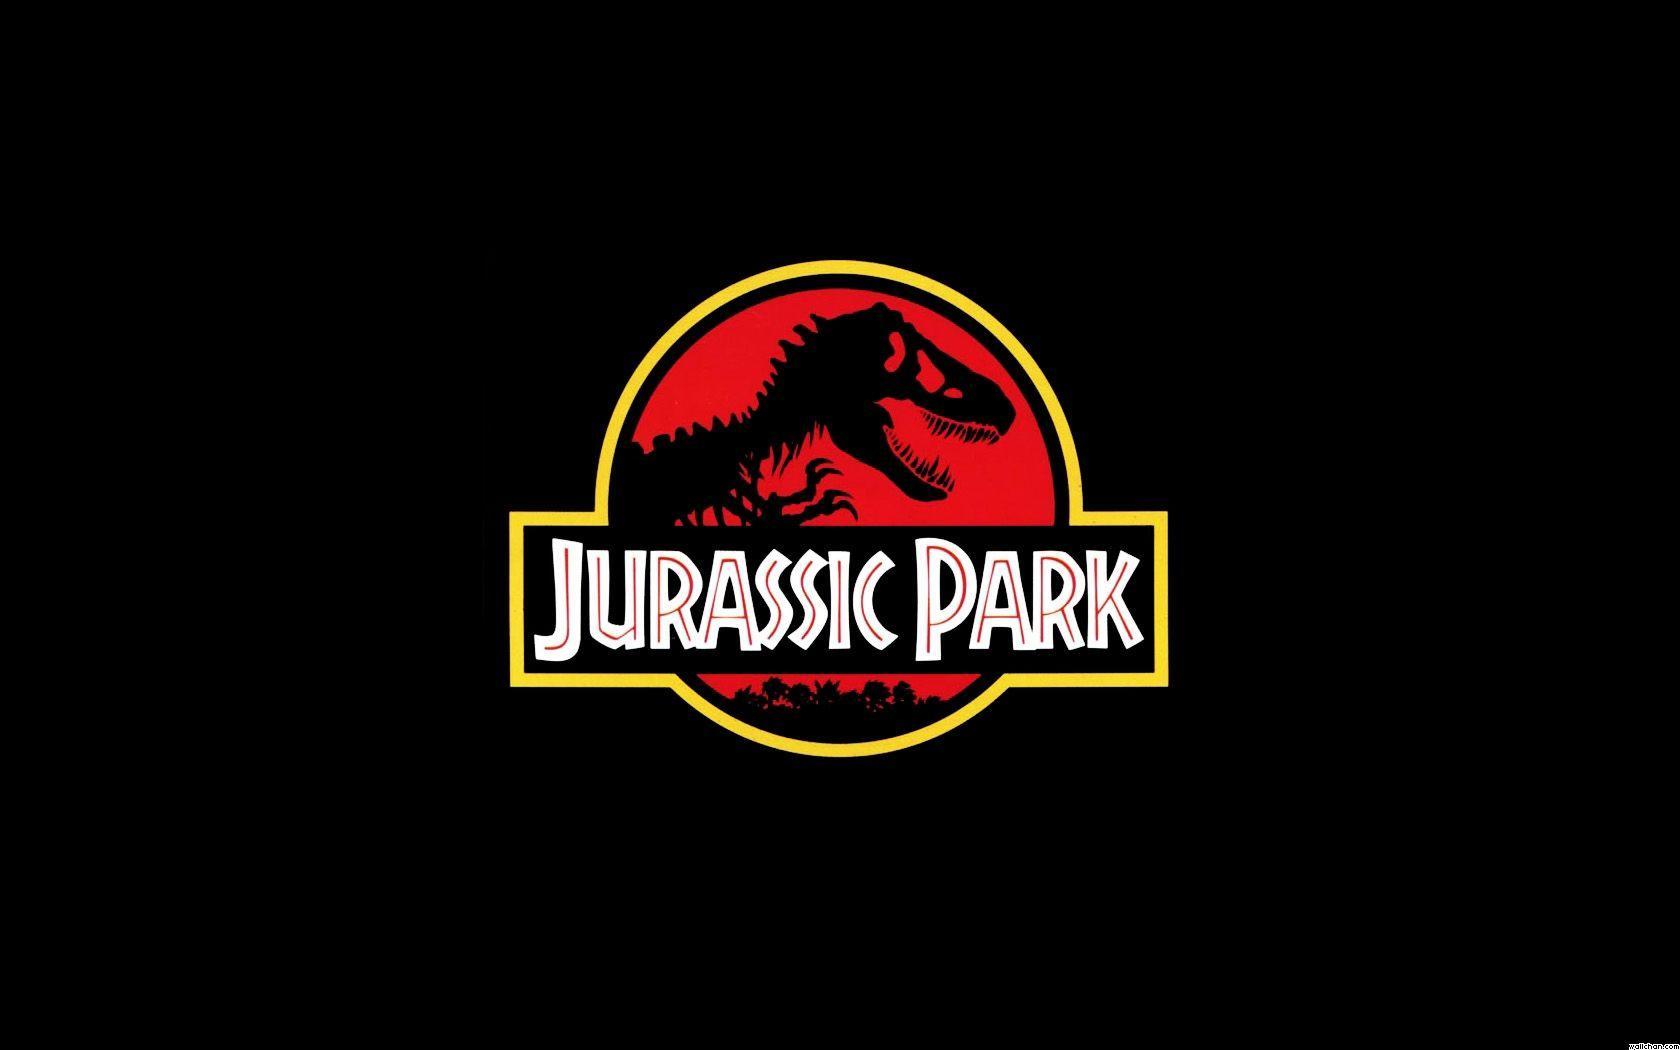 Jurassic Park Wallpapers - Wallpaper Cave